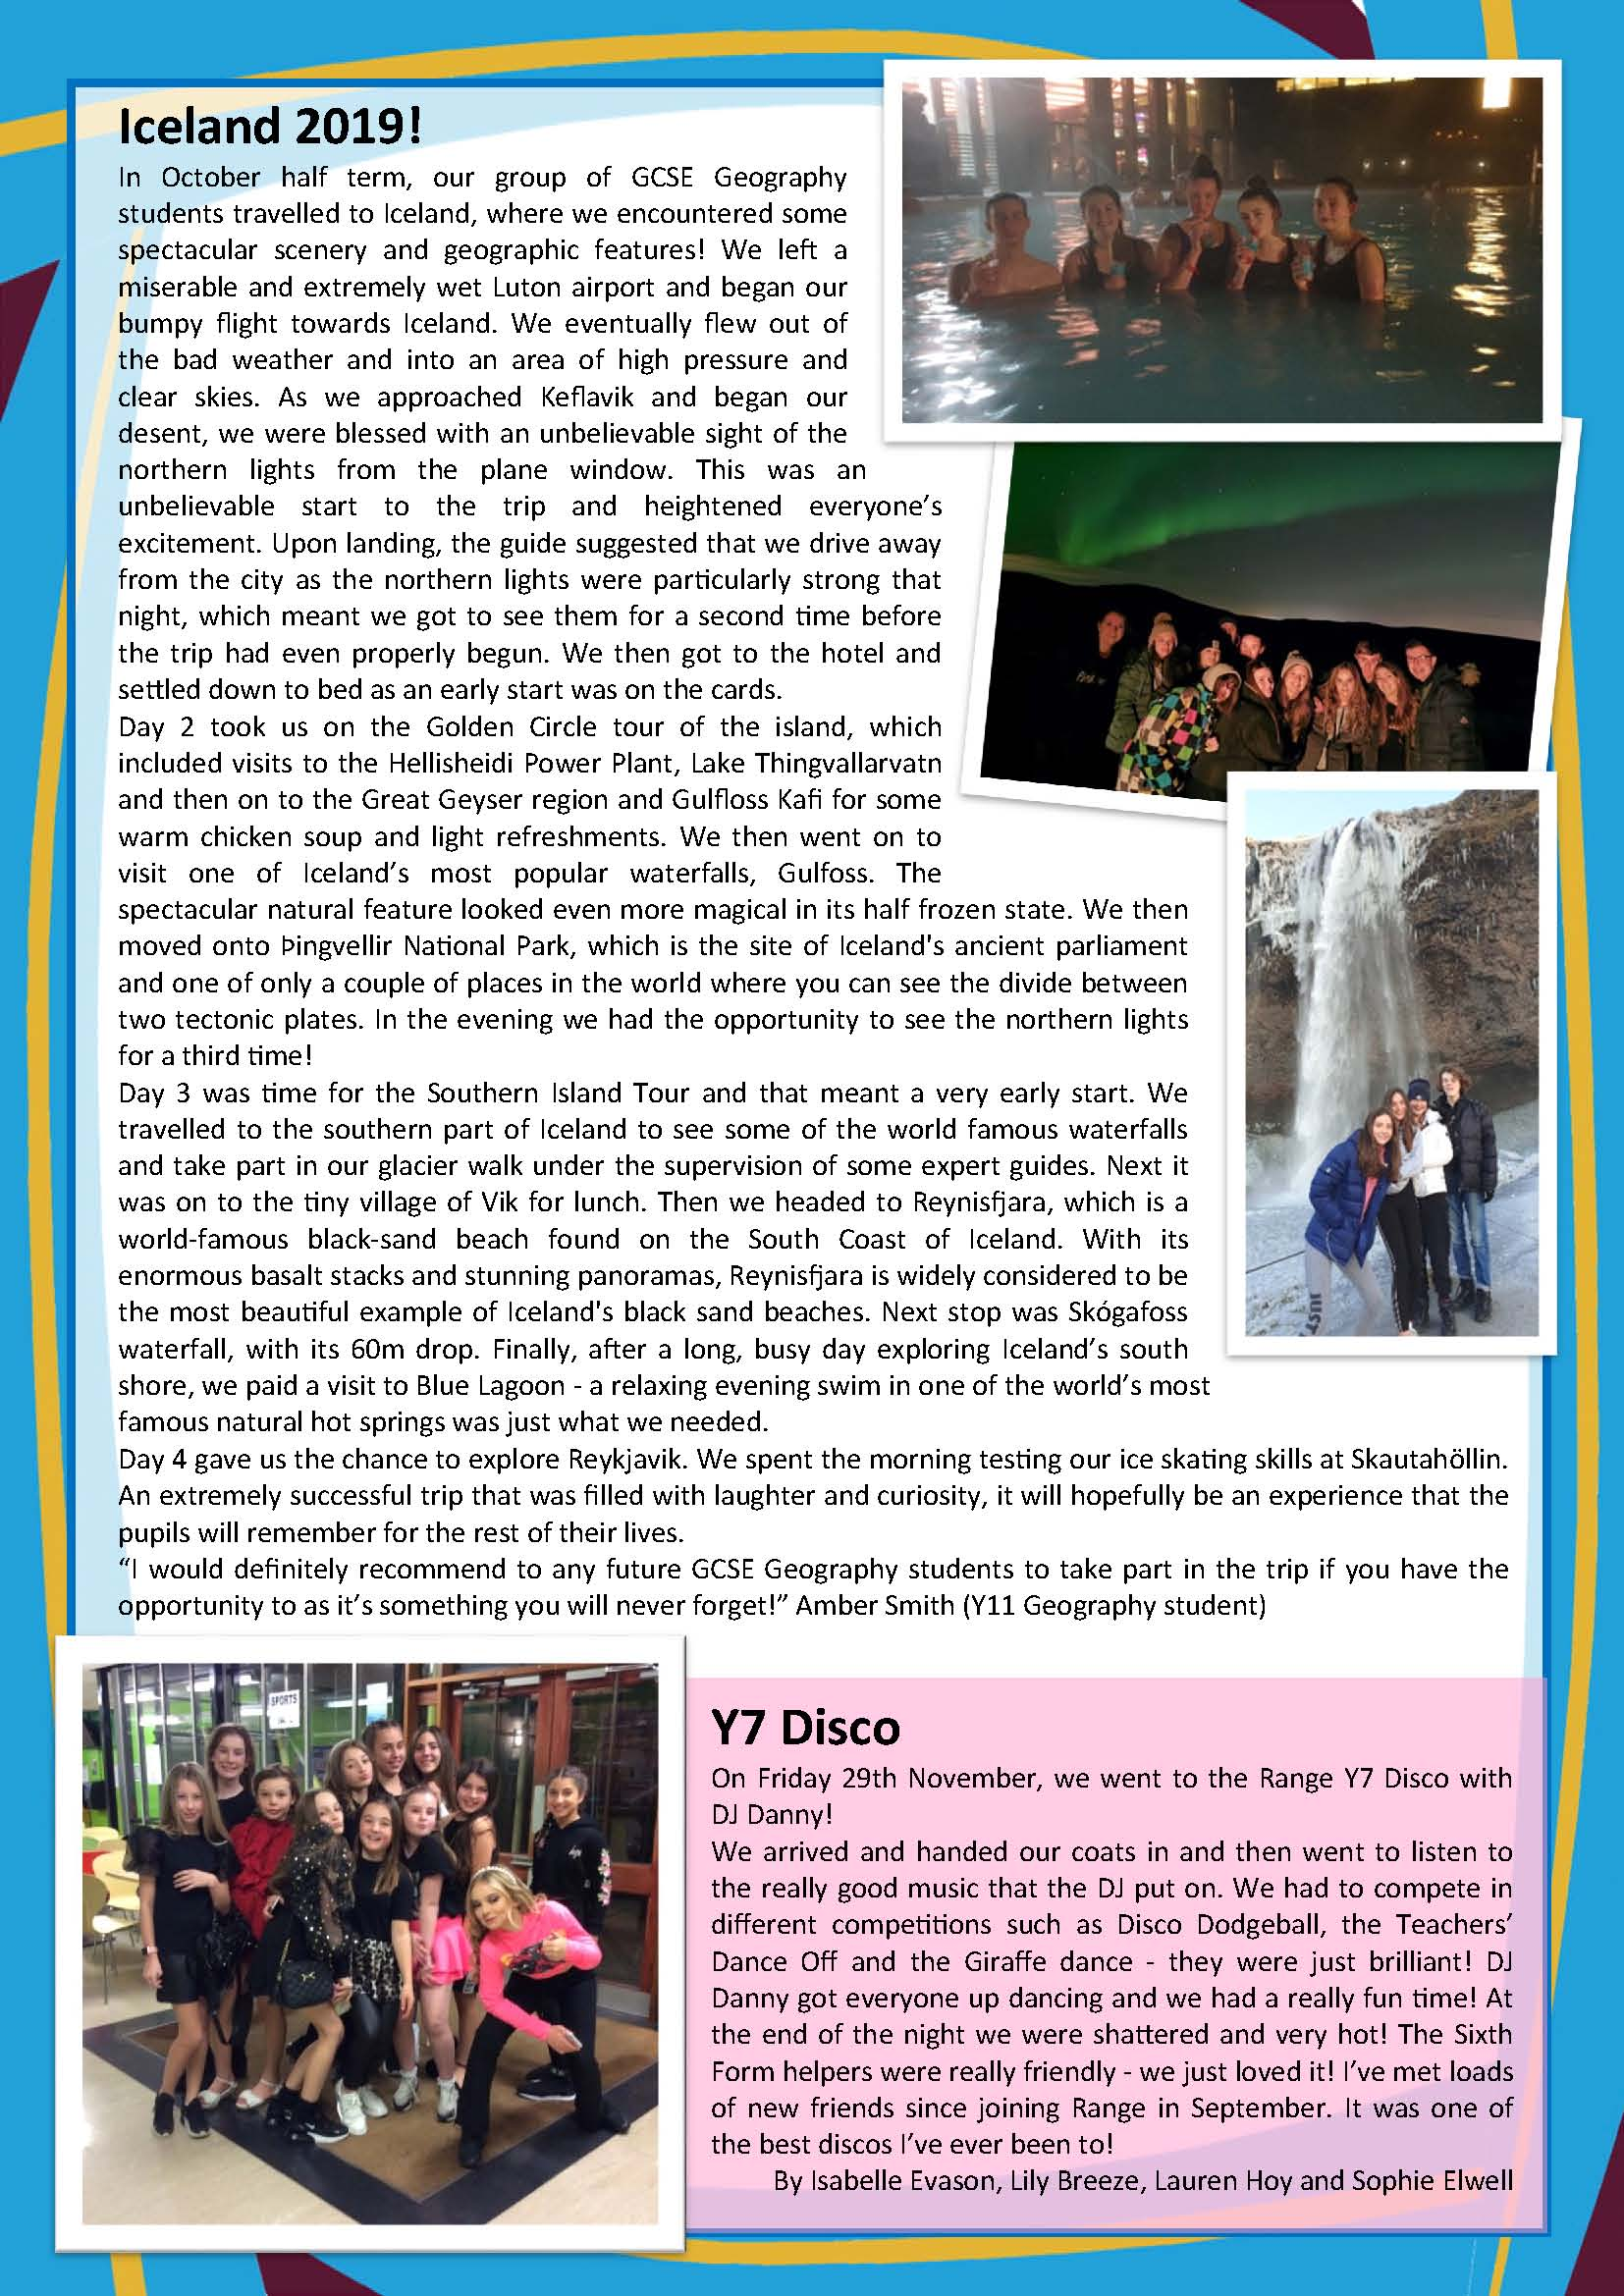 http://www.range.sefton.sch.uk/wp-content/uploads/2019/12/Newsletter-Dec-2019_Page_12.jpg